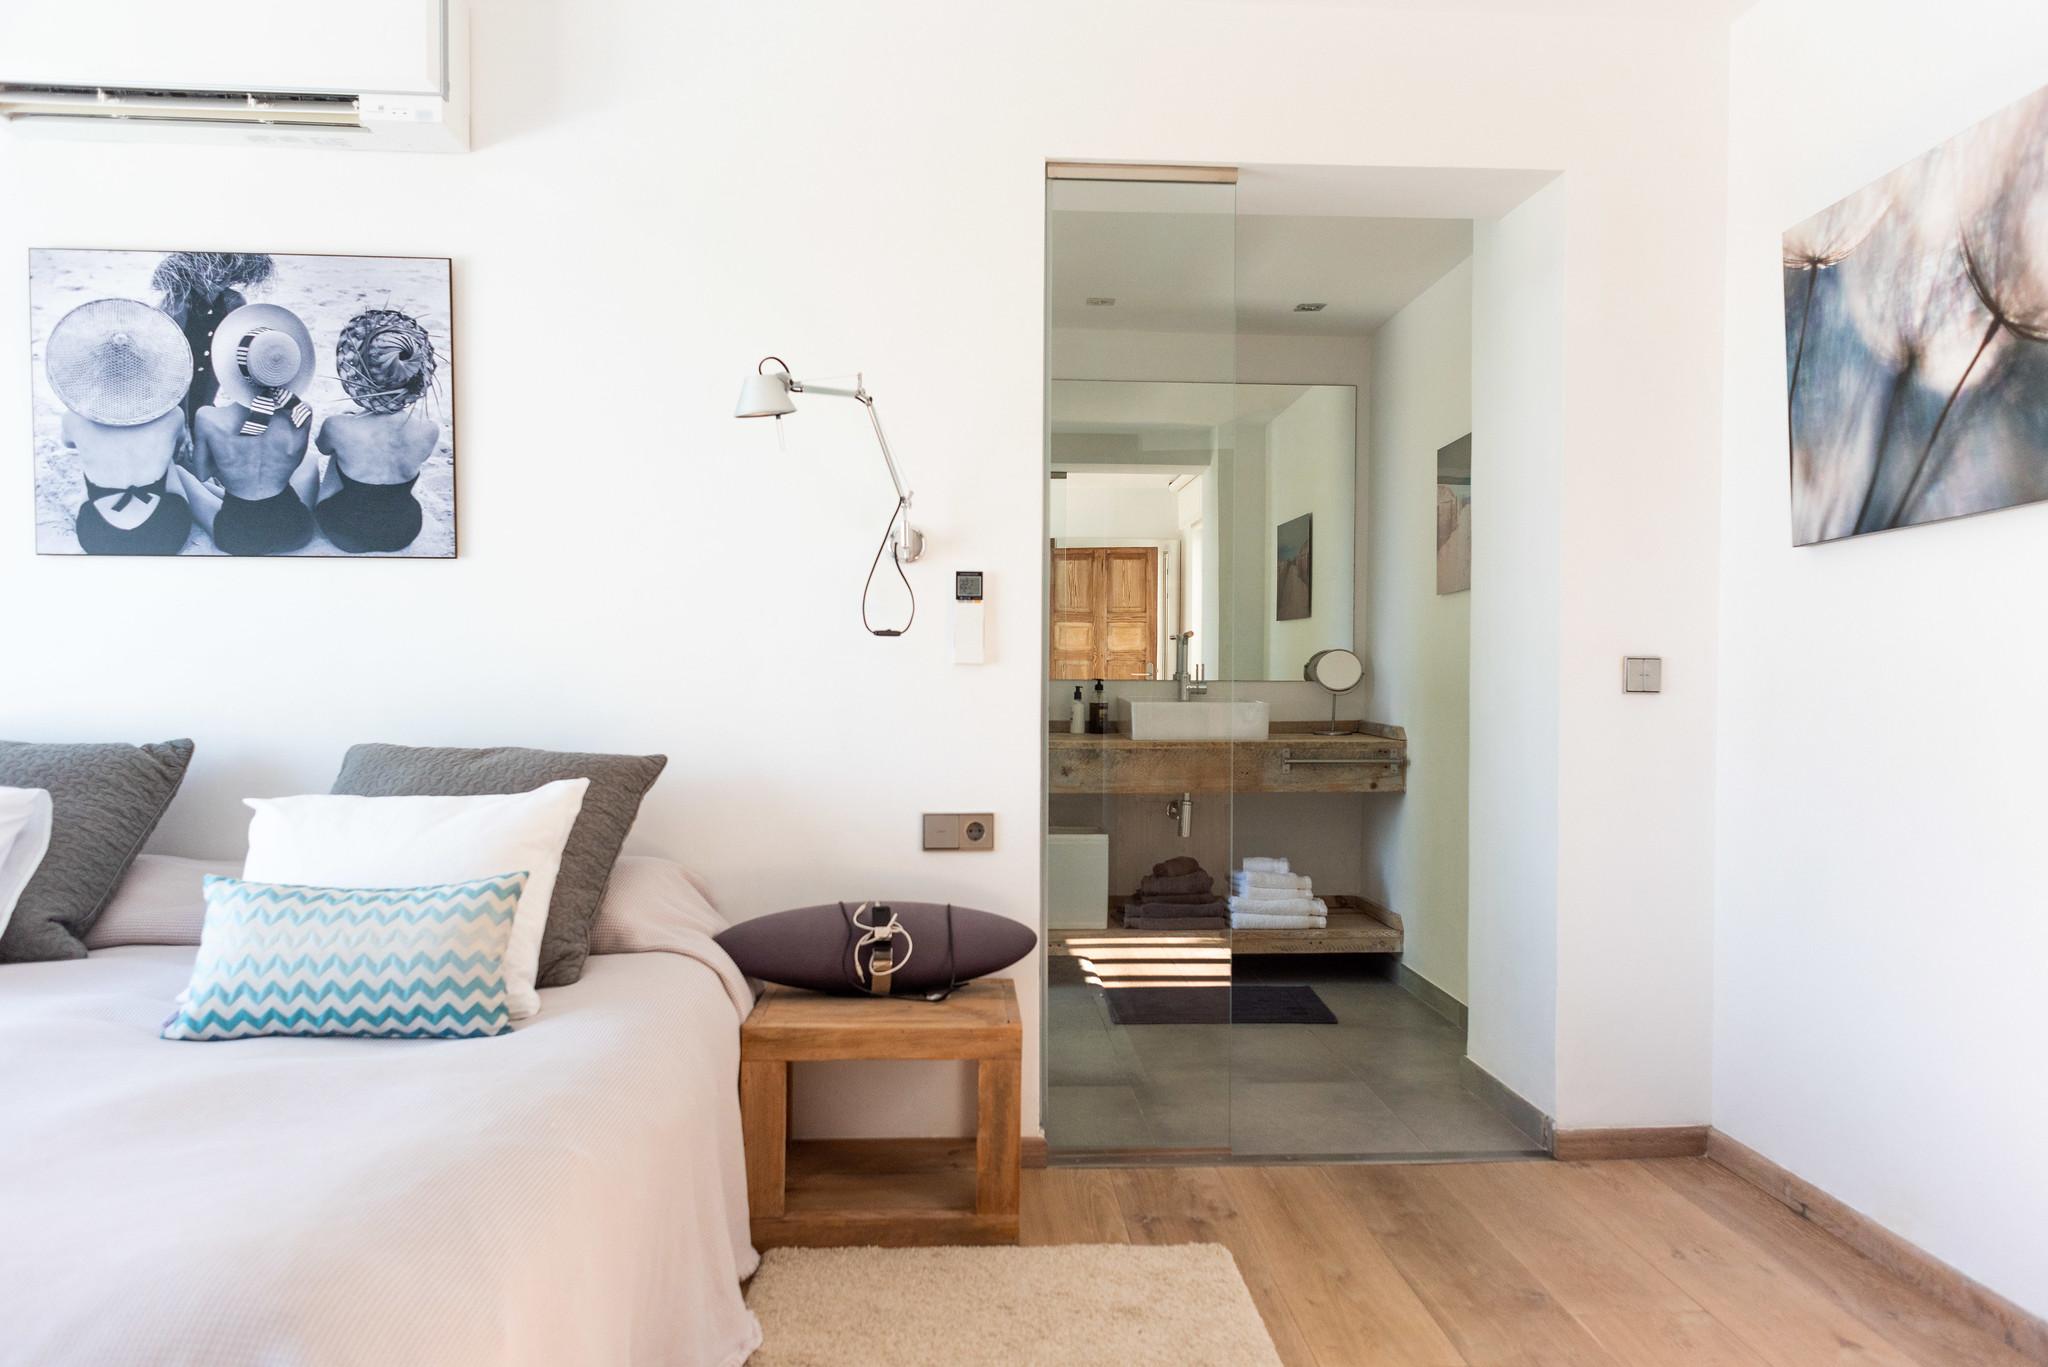 https://www.white-ibiza.com/wp-content/uploads/2020/05/white-ibiza-villas-can-dela-bedroom-into-en-suite.jpg